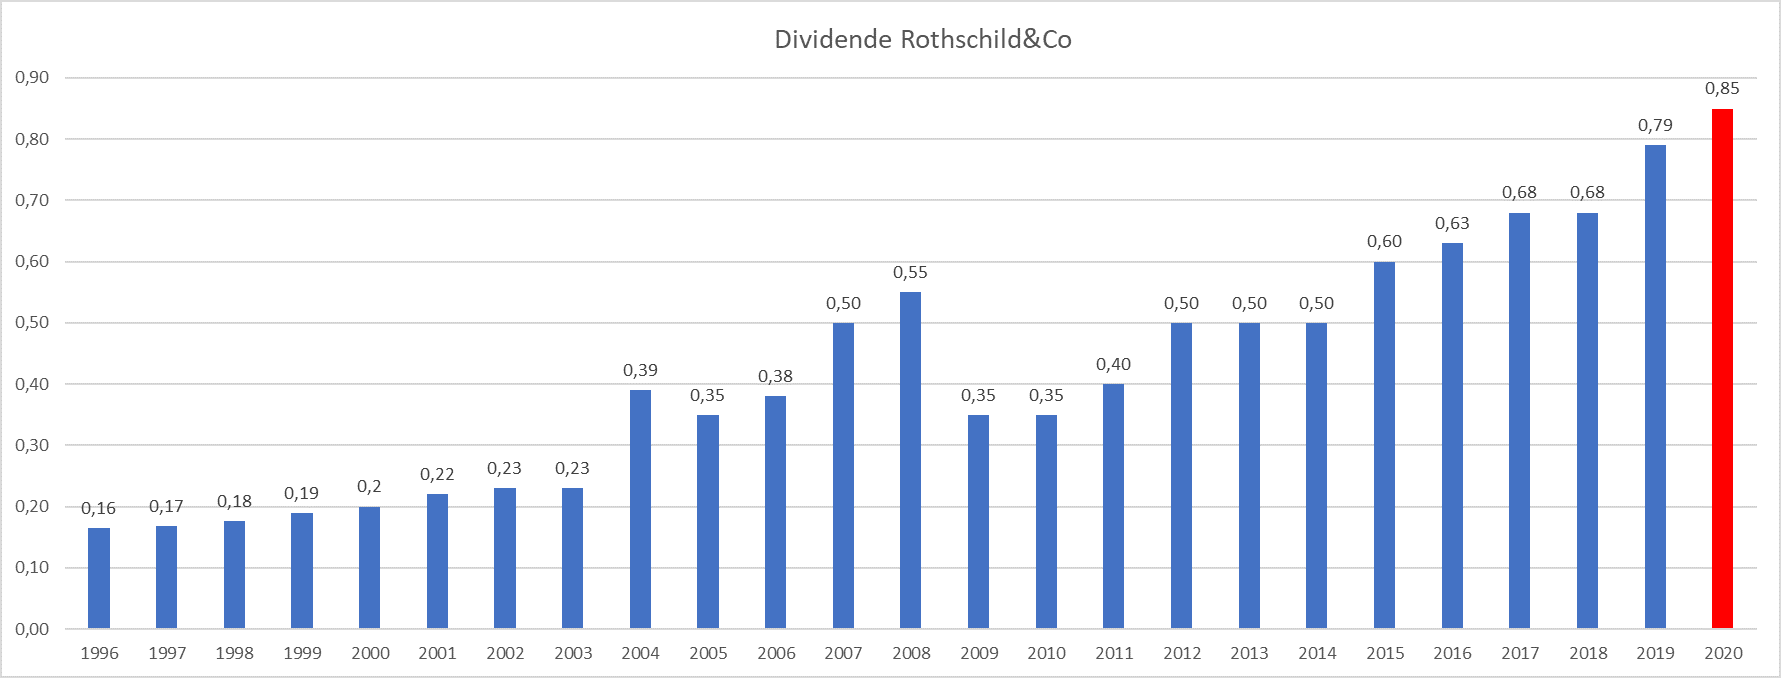 Presque Dividend Aristocrats France Rothschild